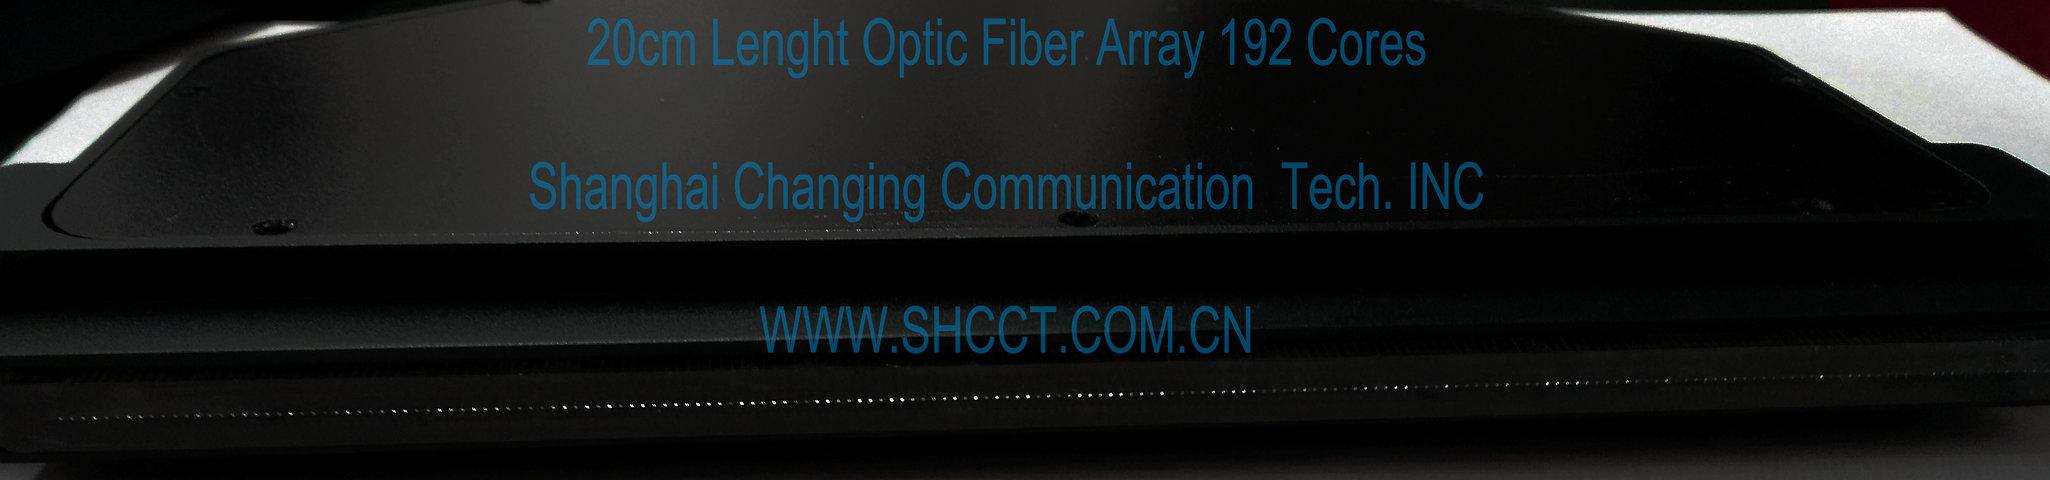 long length large core optic fiber array